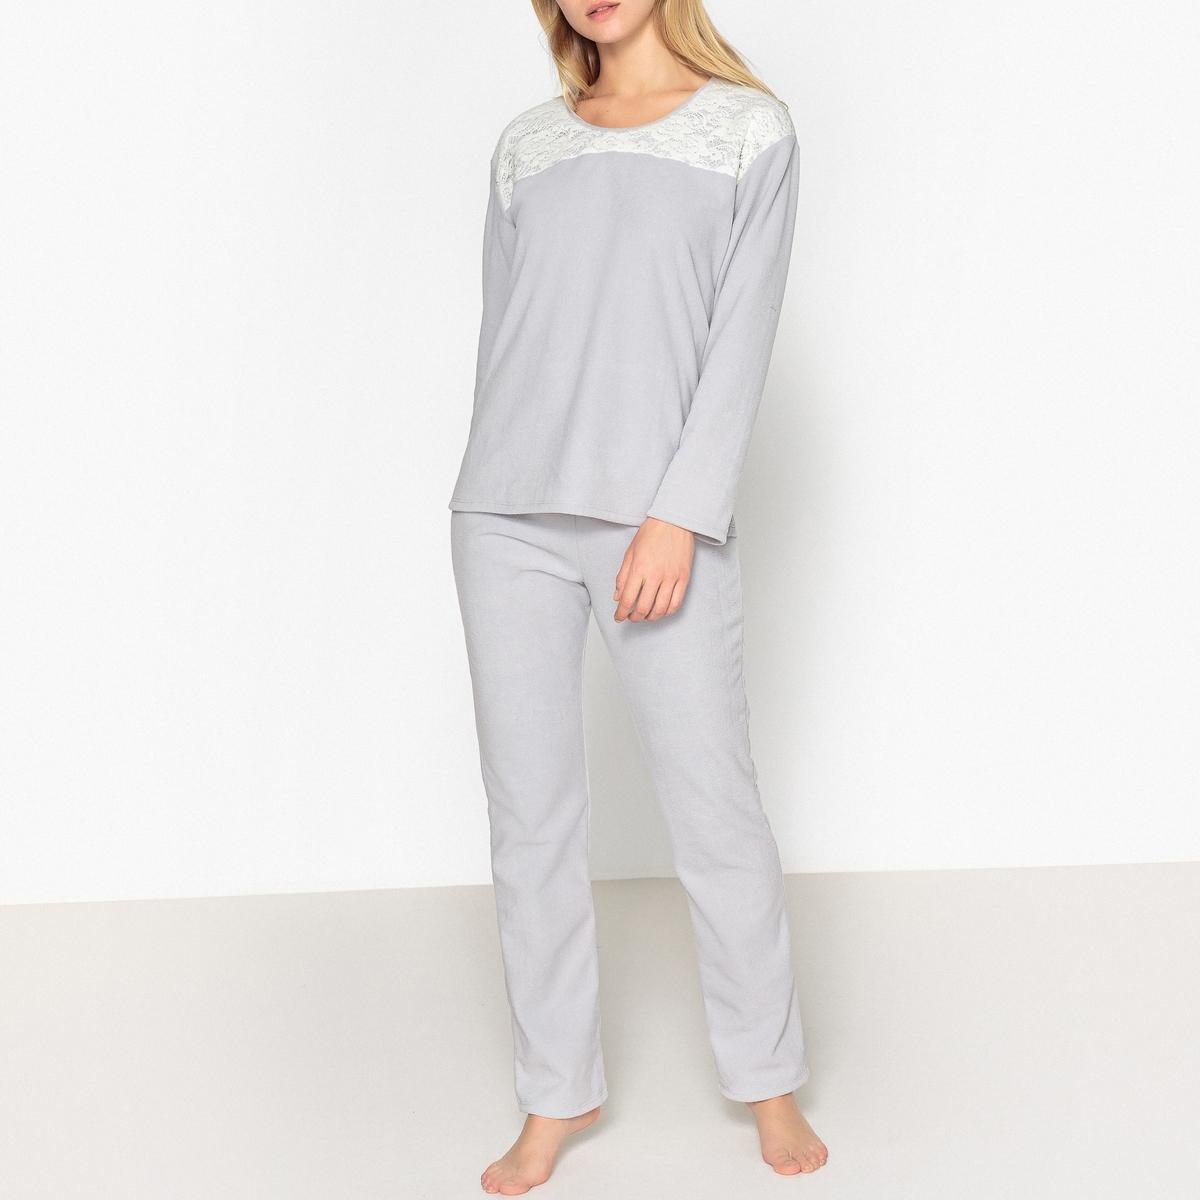 Пижама утепленная из микрофлиса, Datcha avanti piccolo пижама утепленная ух ты фиолетовая